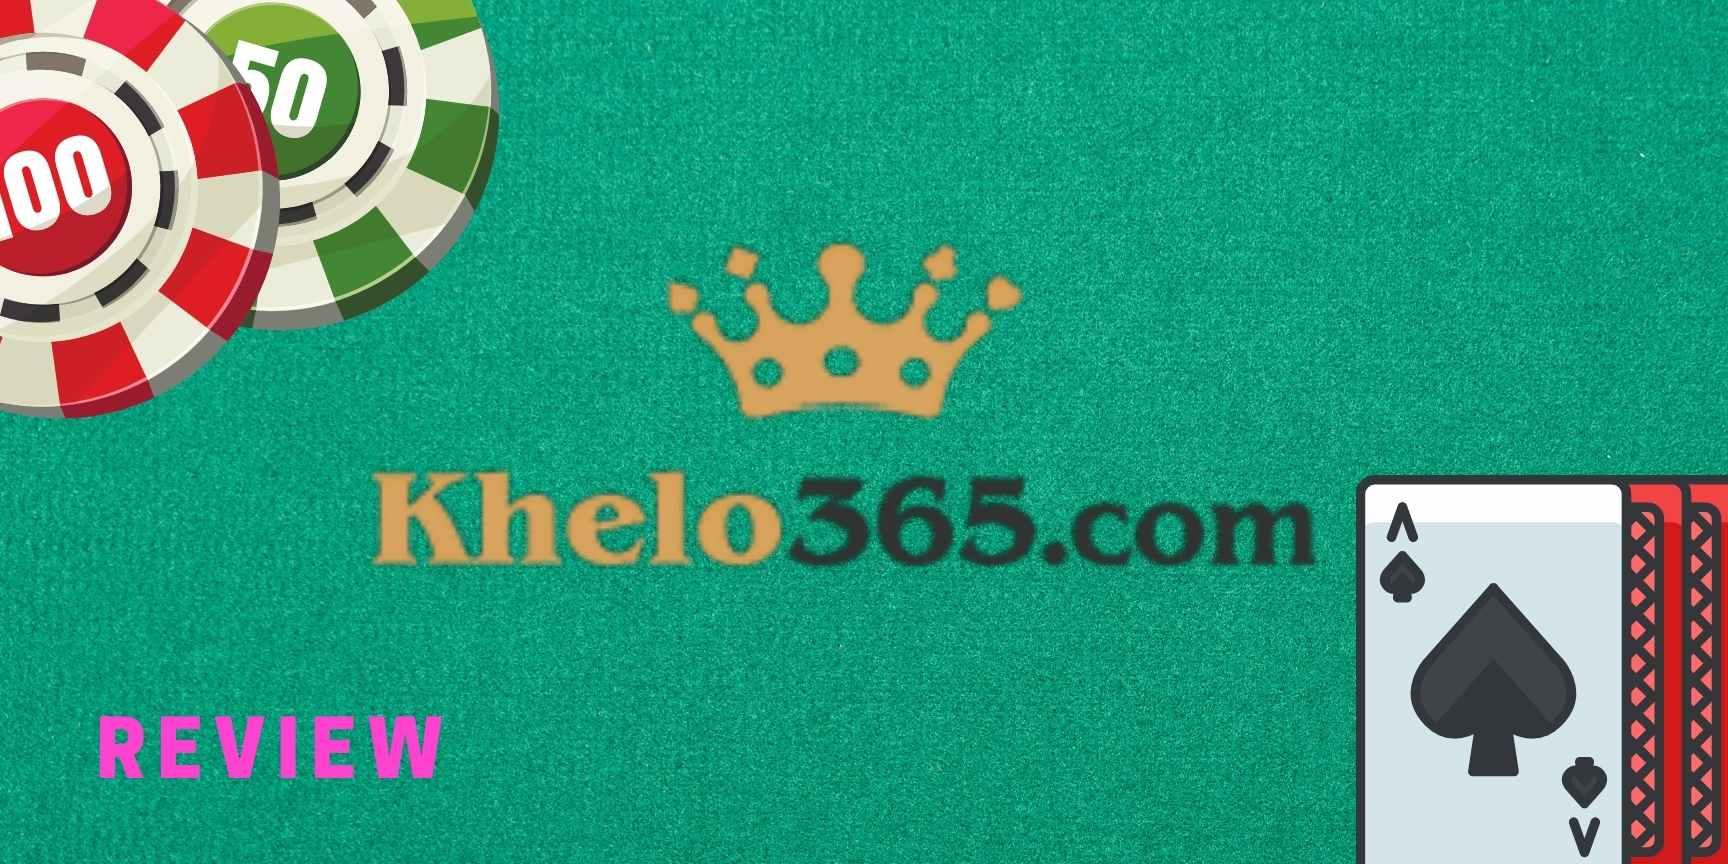 Review of the online poker platform Khelo365